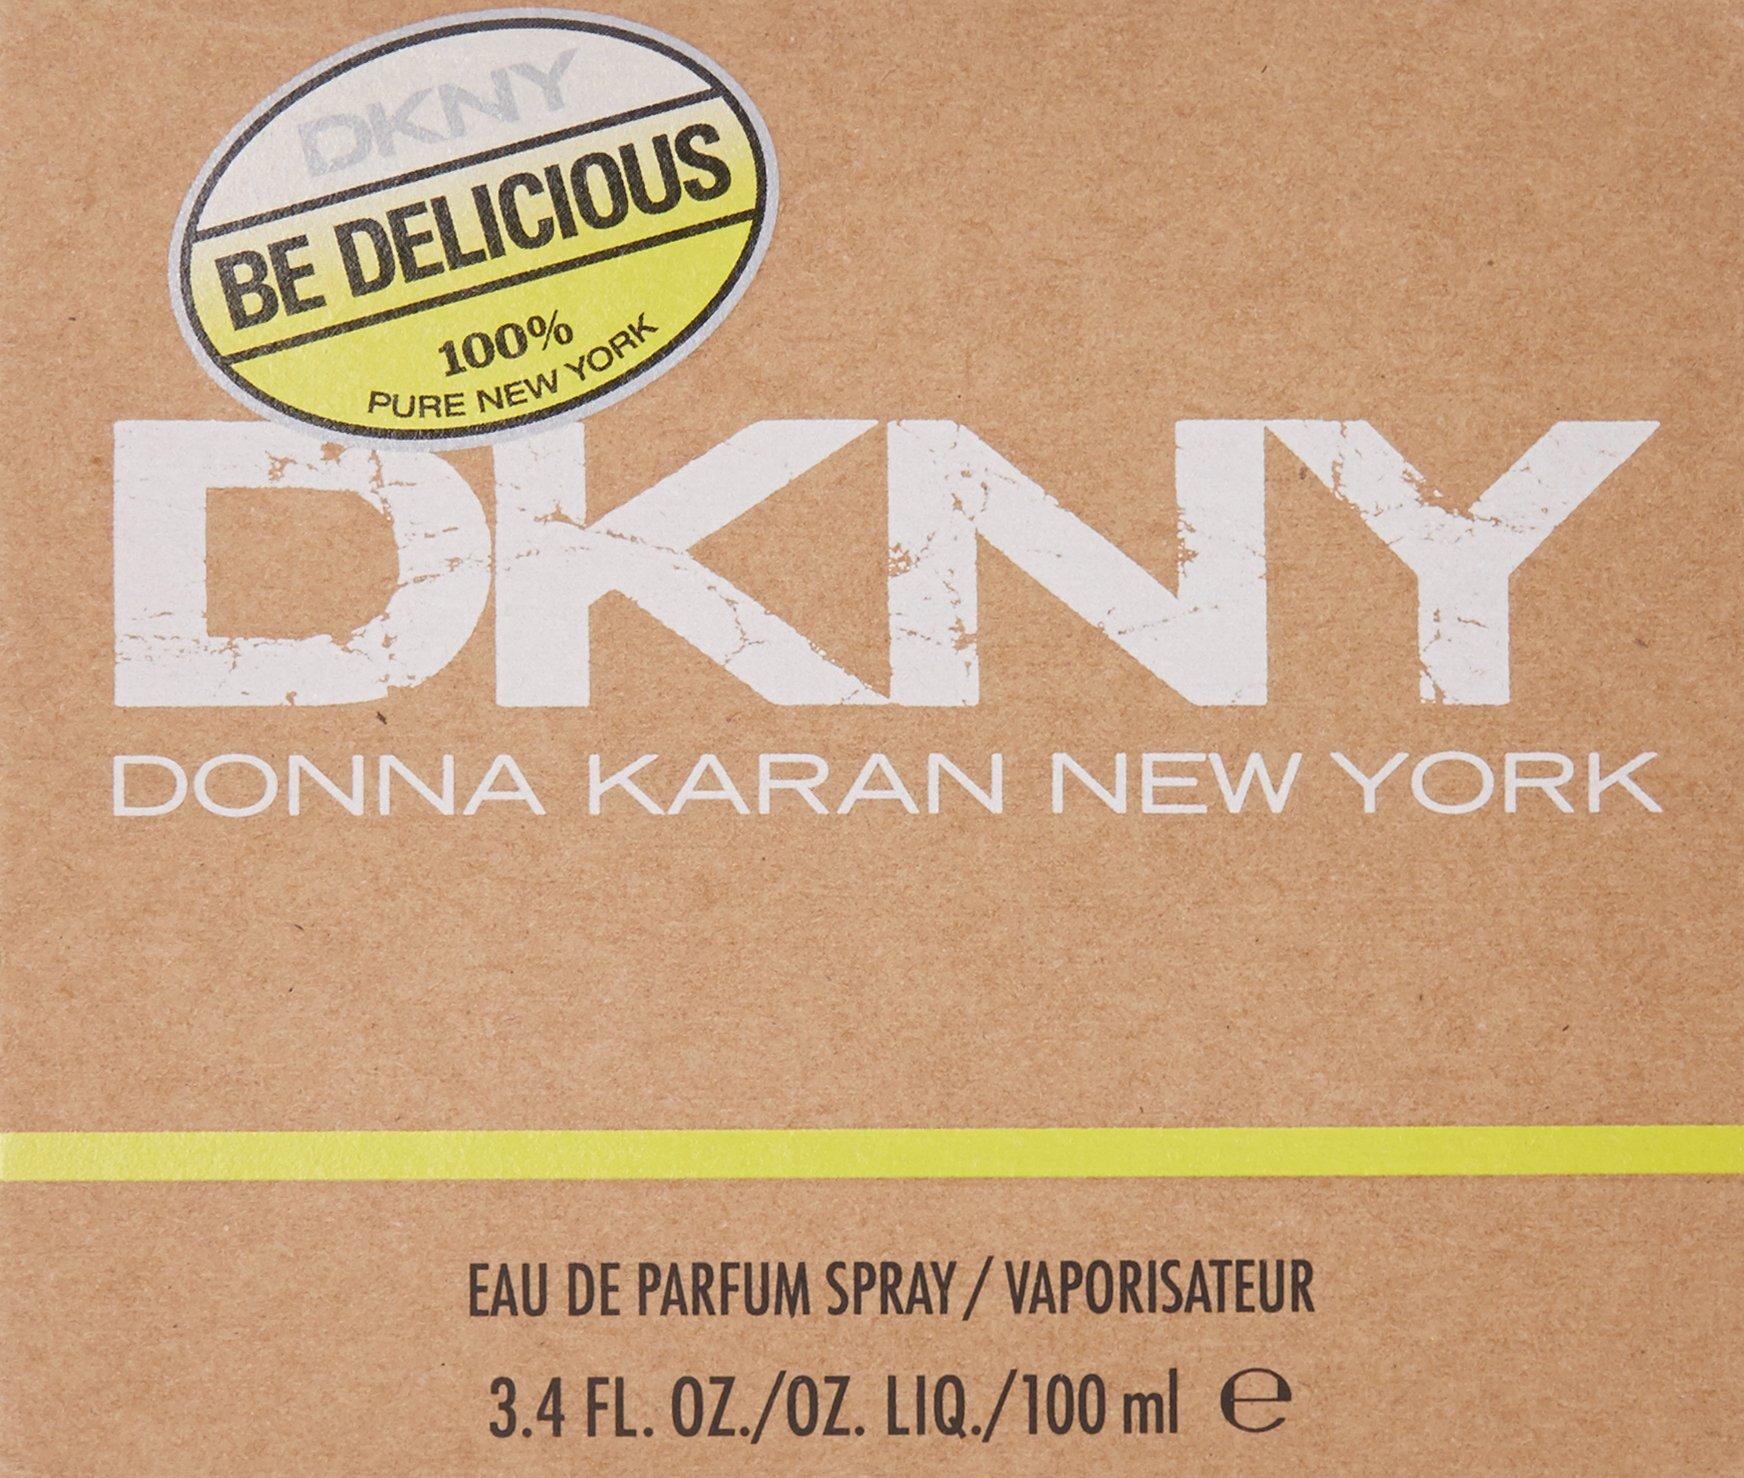 Dkny Be Delicious By Donna Karan For Women. Eau De Parfum Spray 3.4-Ounce Bottle by Donna Karan